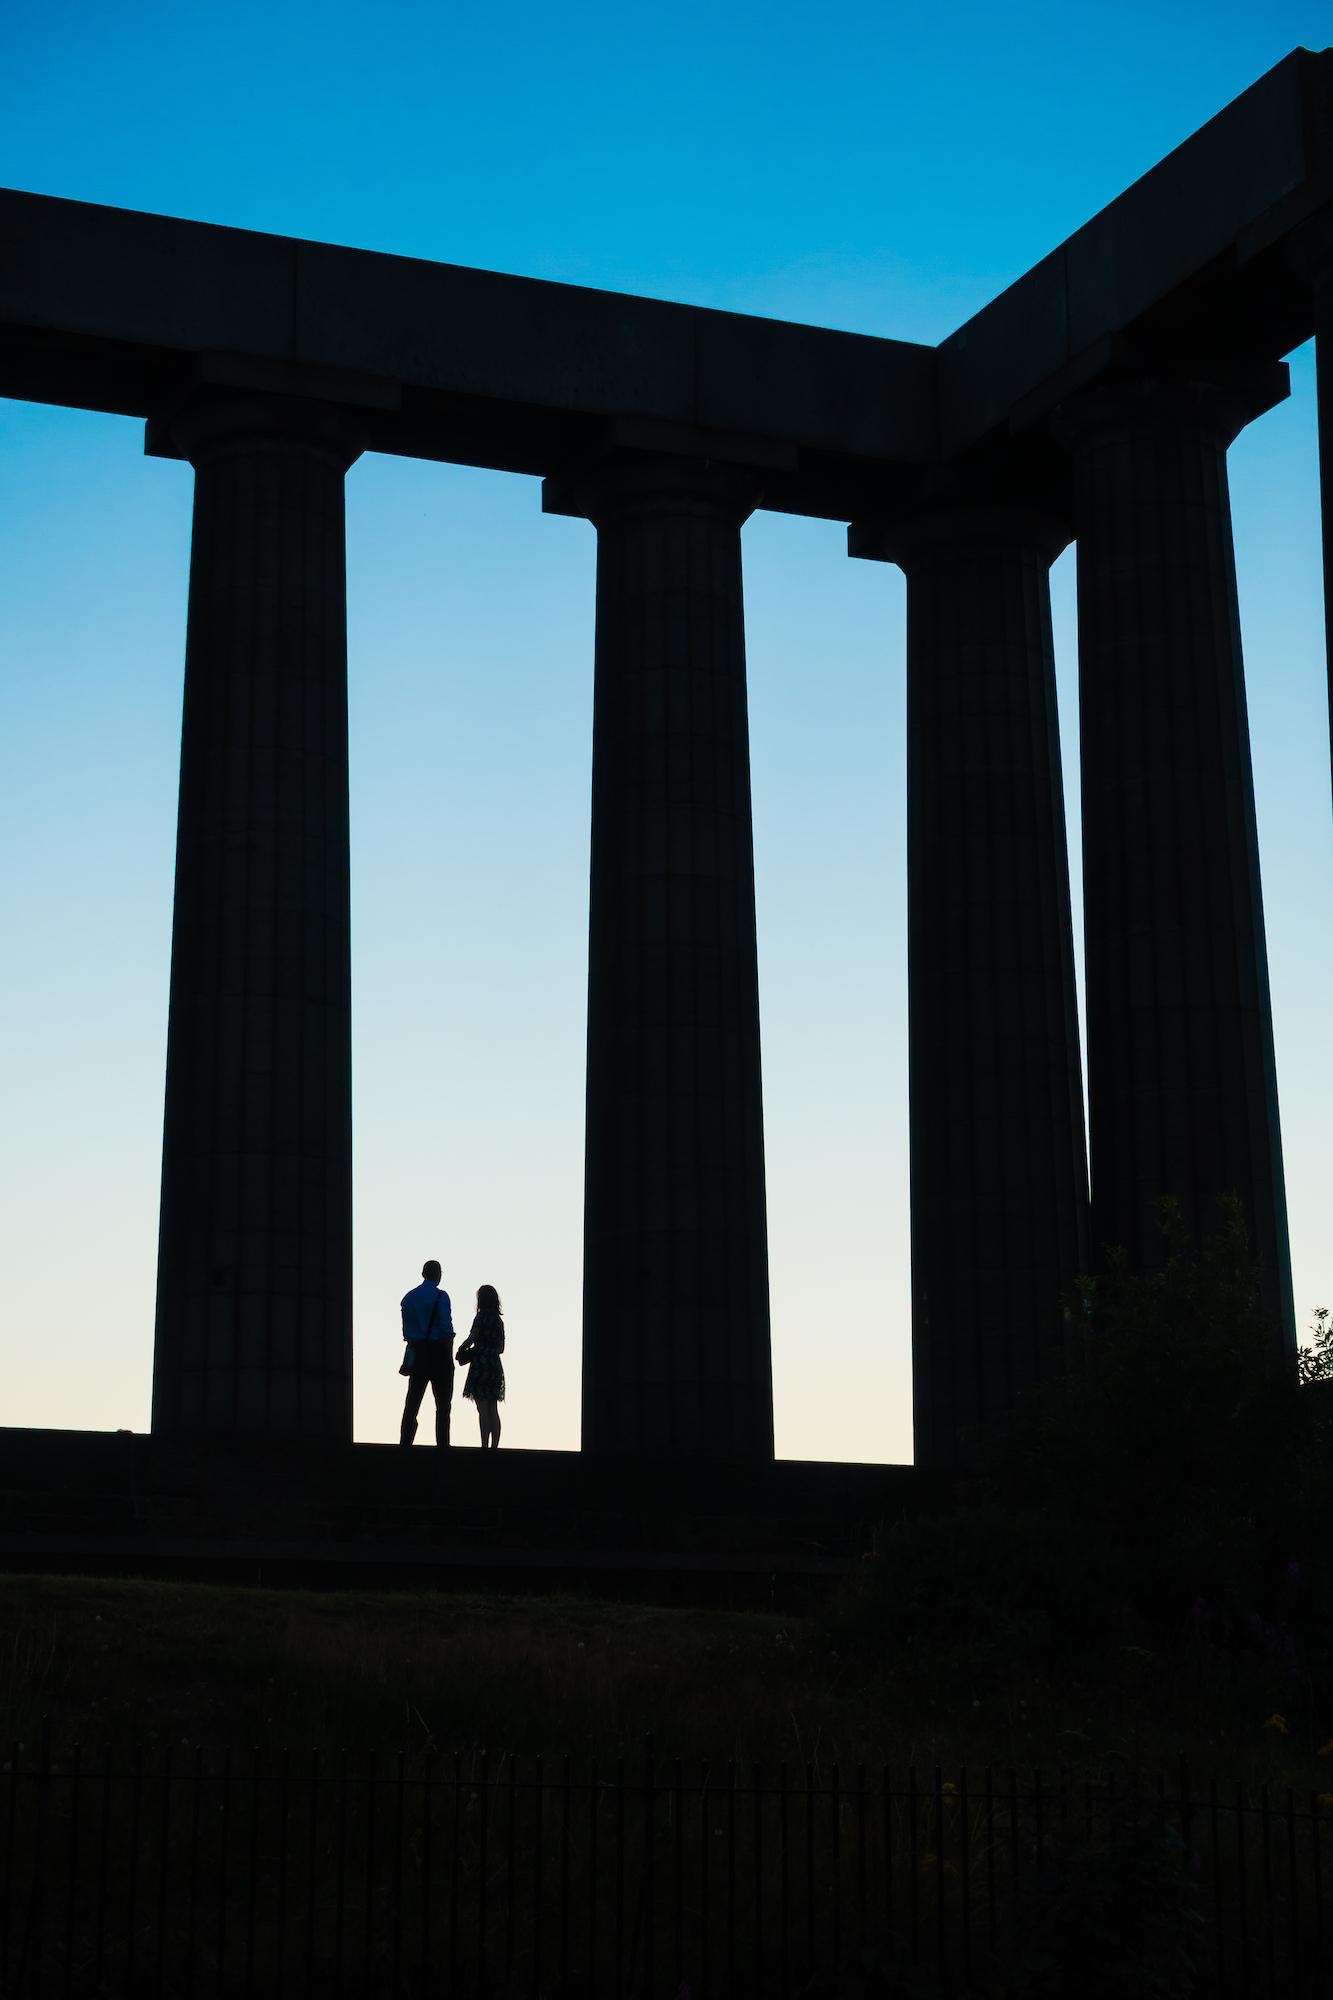 (209) (PO) Couple enjoying a moment, The National Monument of Scotland, Calton Hill, Edinburgh, Scotland.jpg